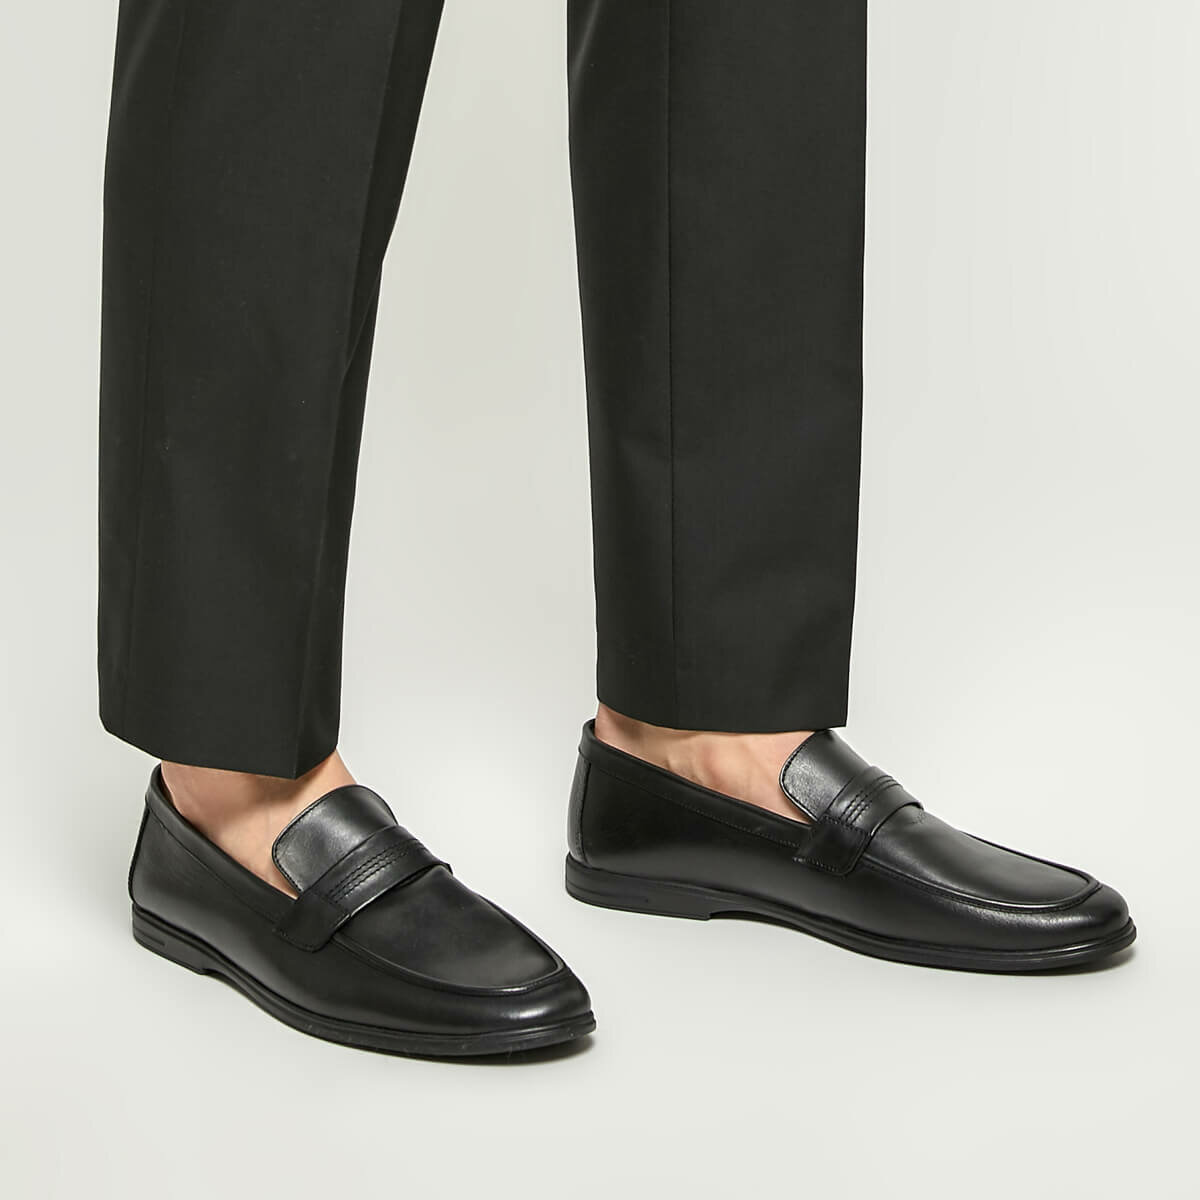 FLO 3892 Black Men 'S Classic Shoes Garamond